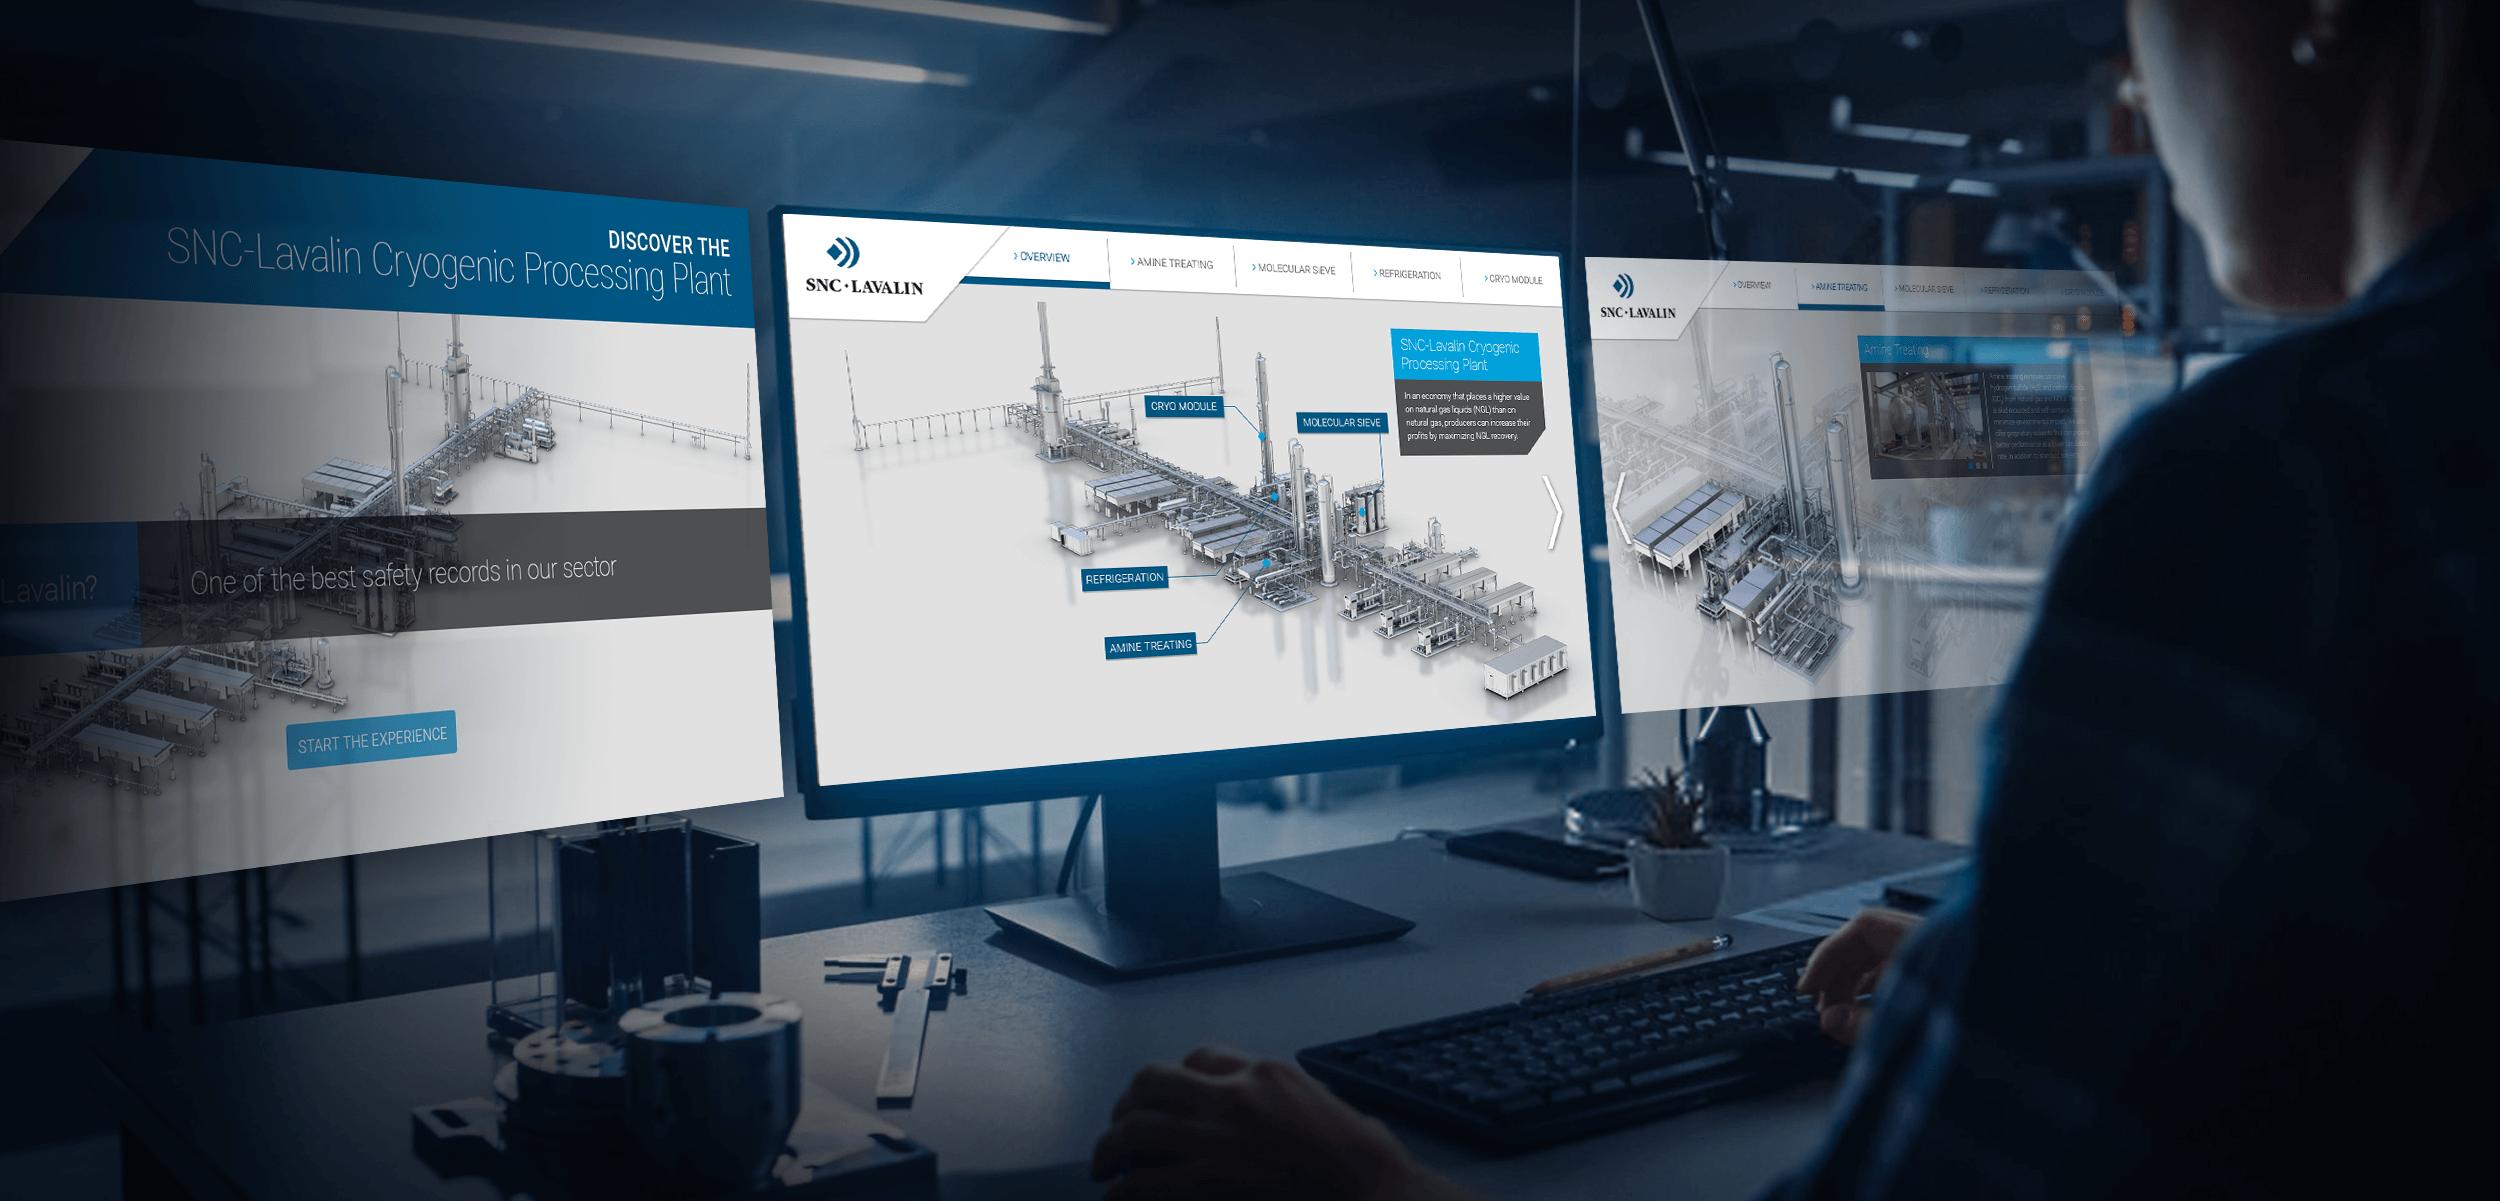 SNC Lavalin Cryogenic Plant Virtual Tour